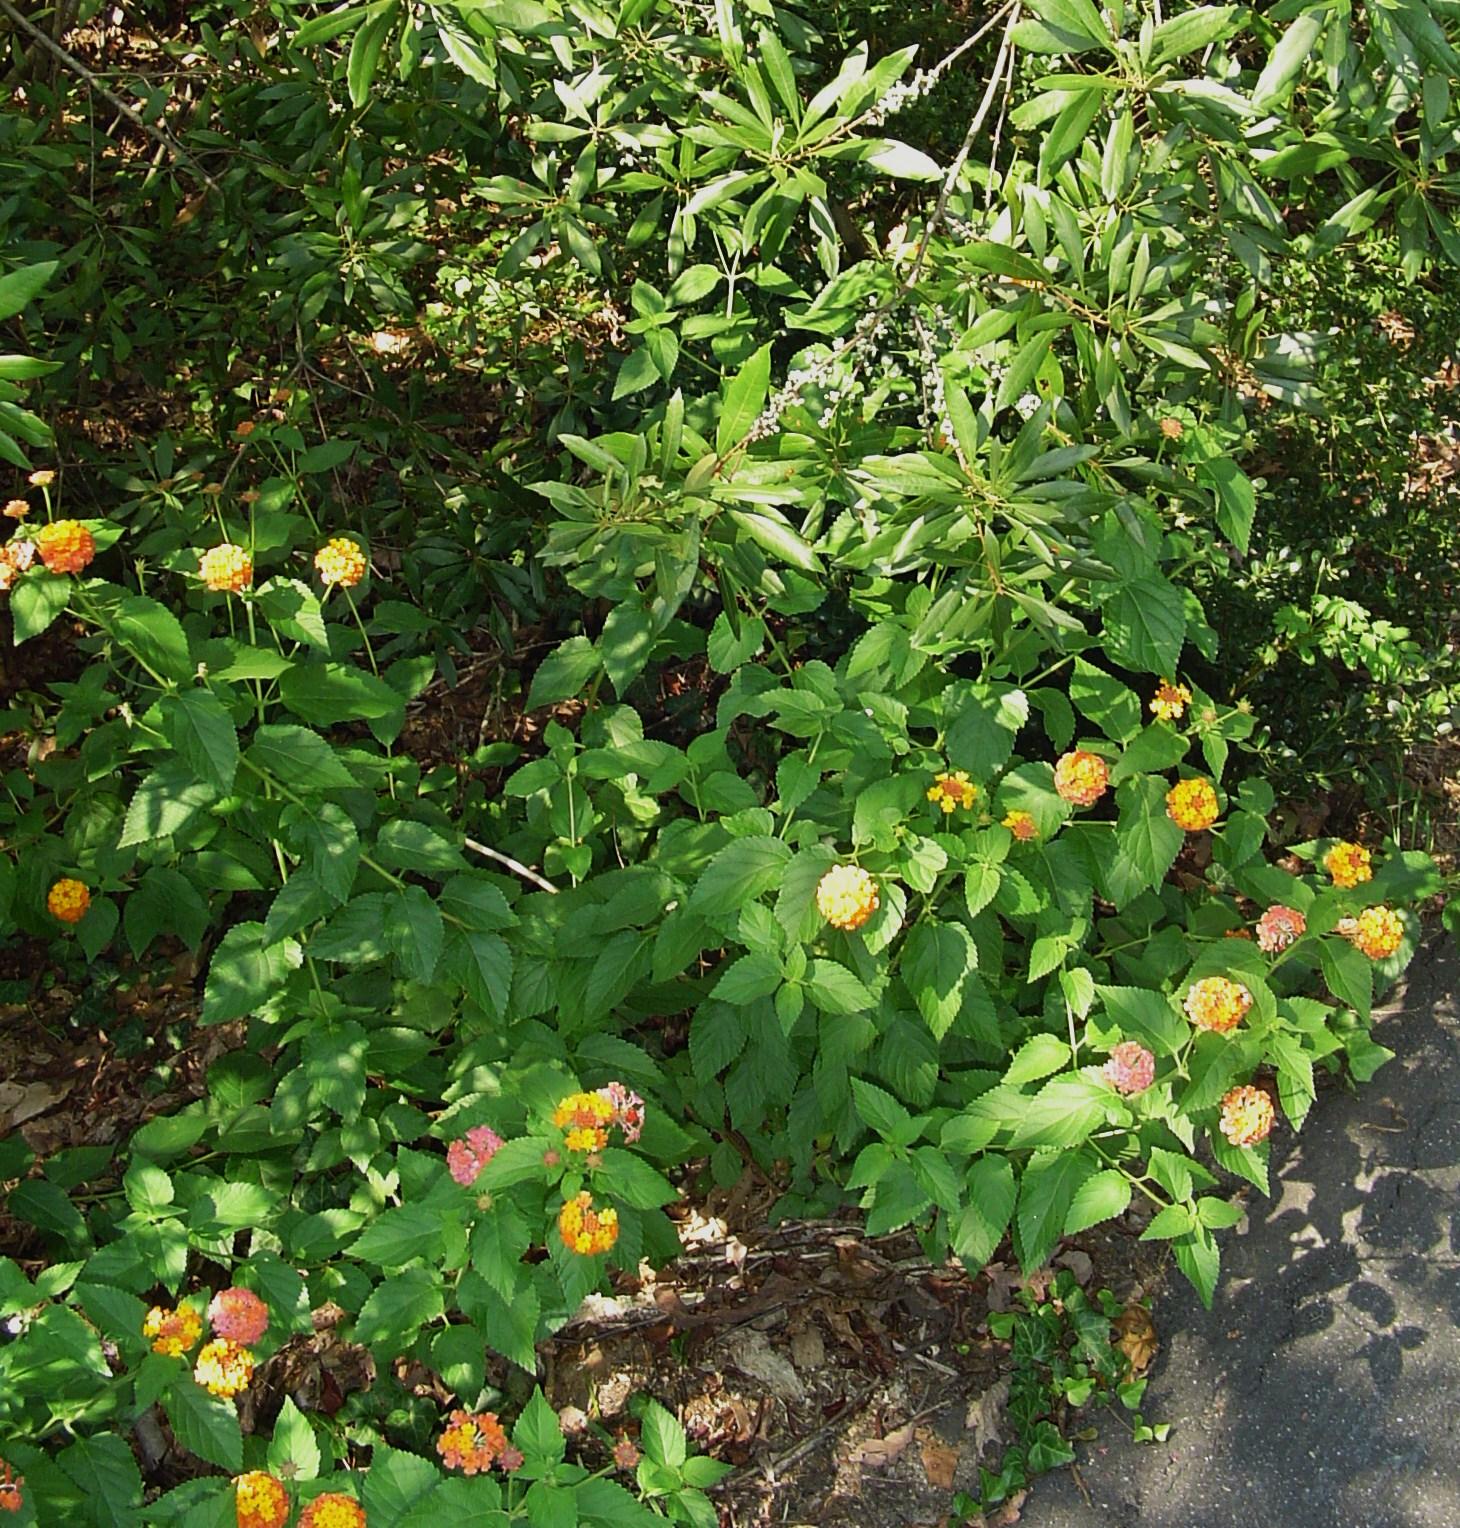 Miss huff perennial lantana forest garden september 8 2013 lantana 002 mightylinksfo Image collections